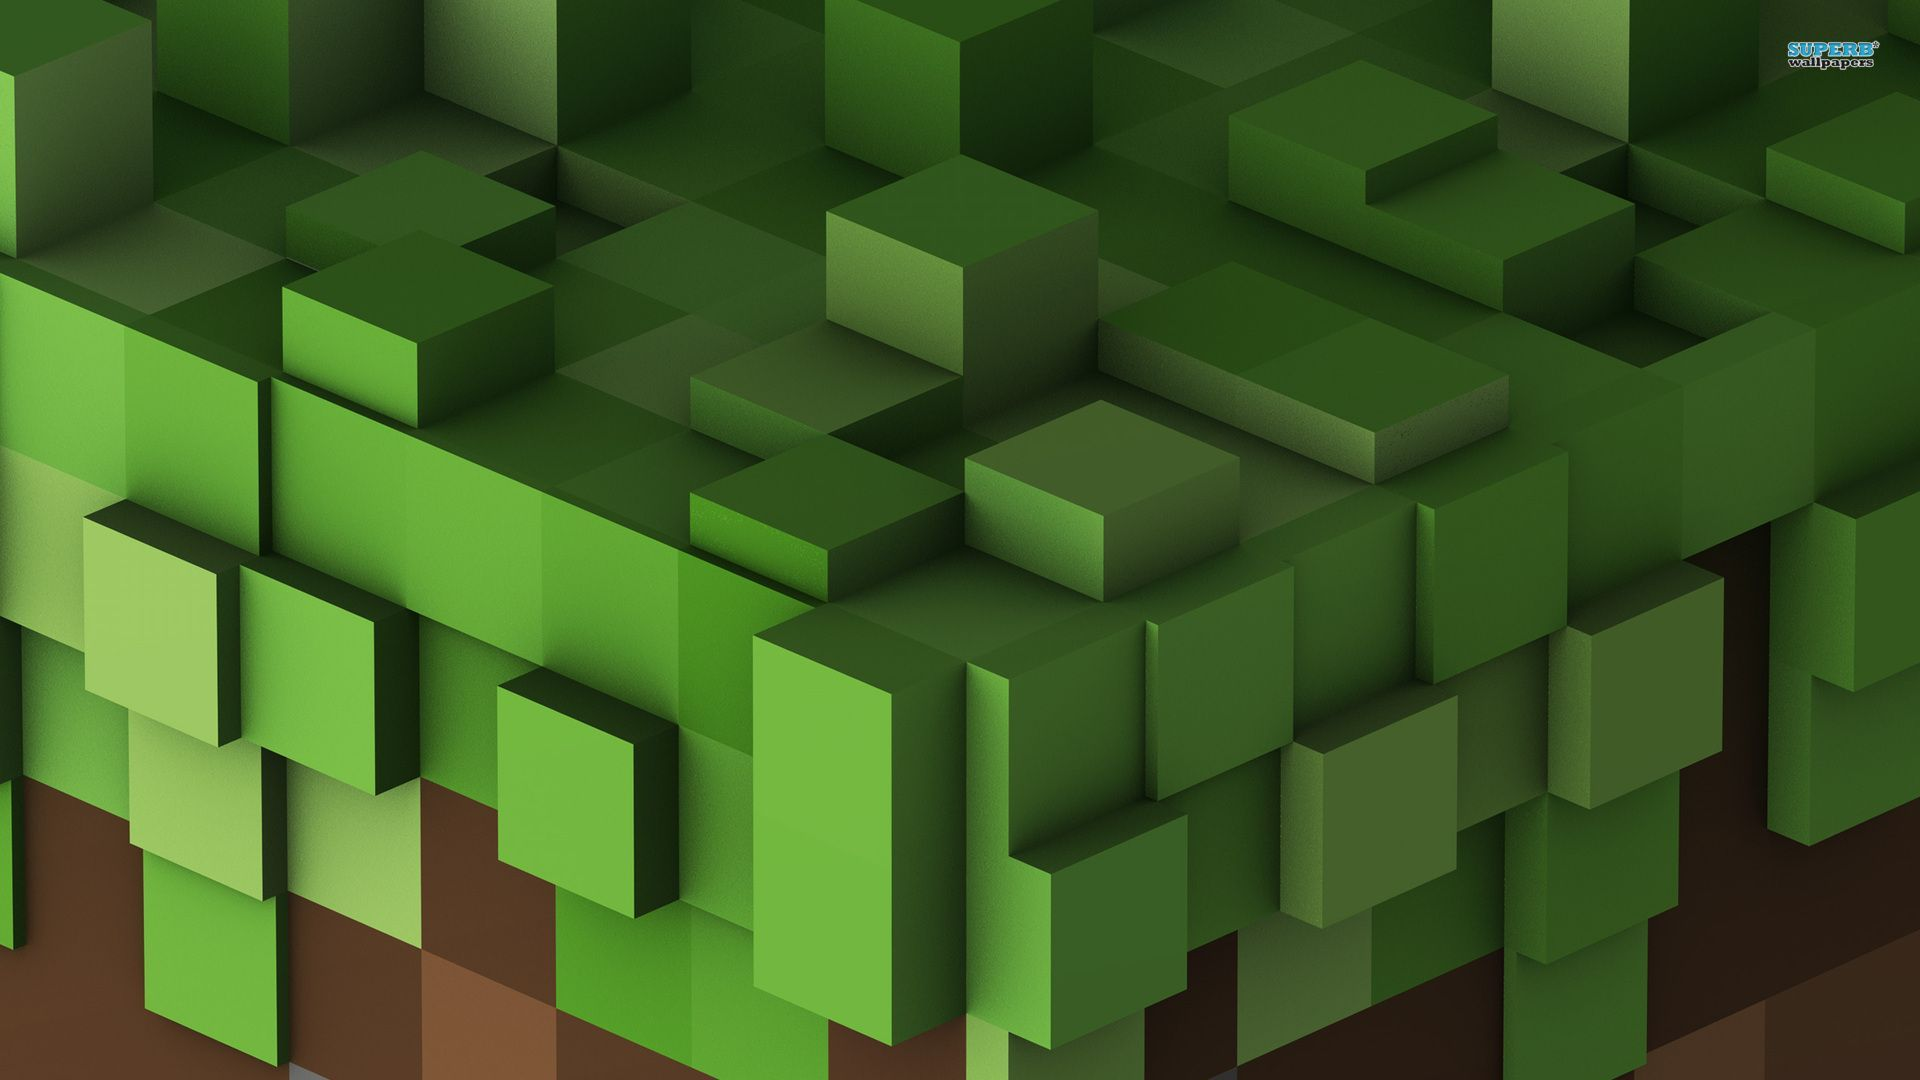 Minecraft Wallpapers 1920x1080